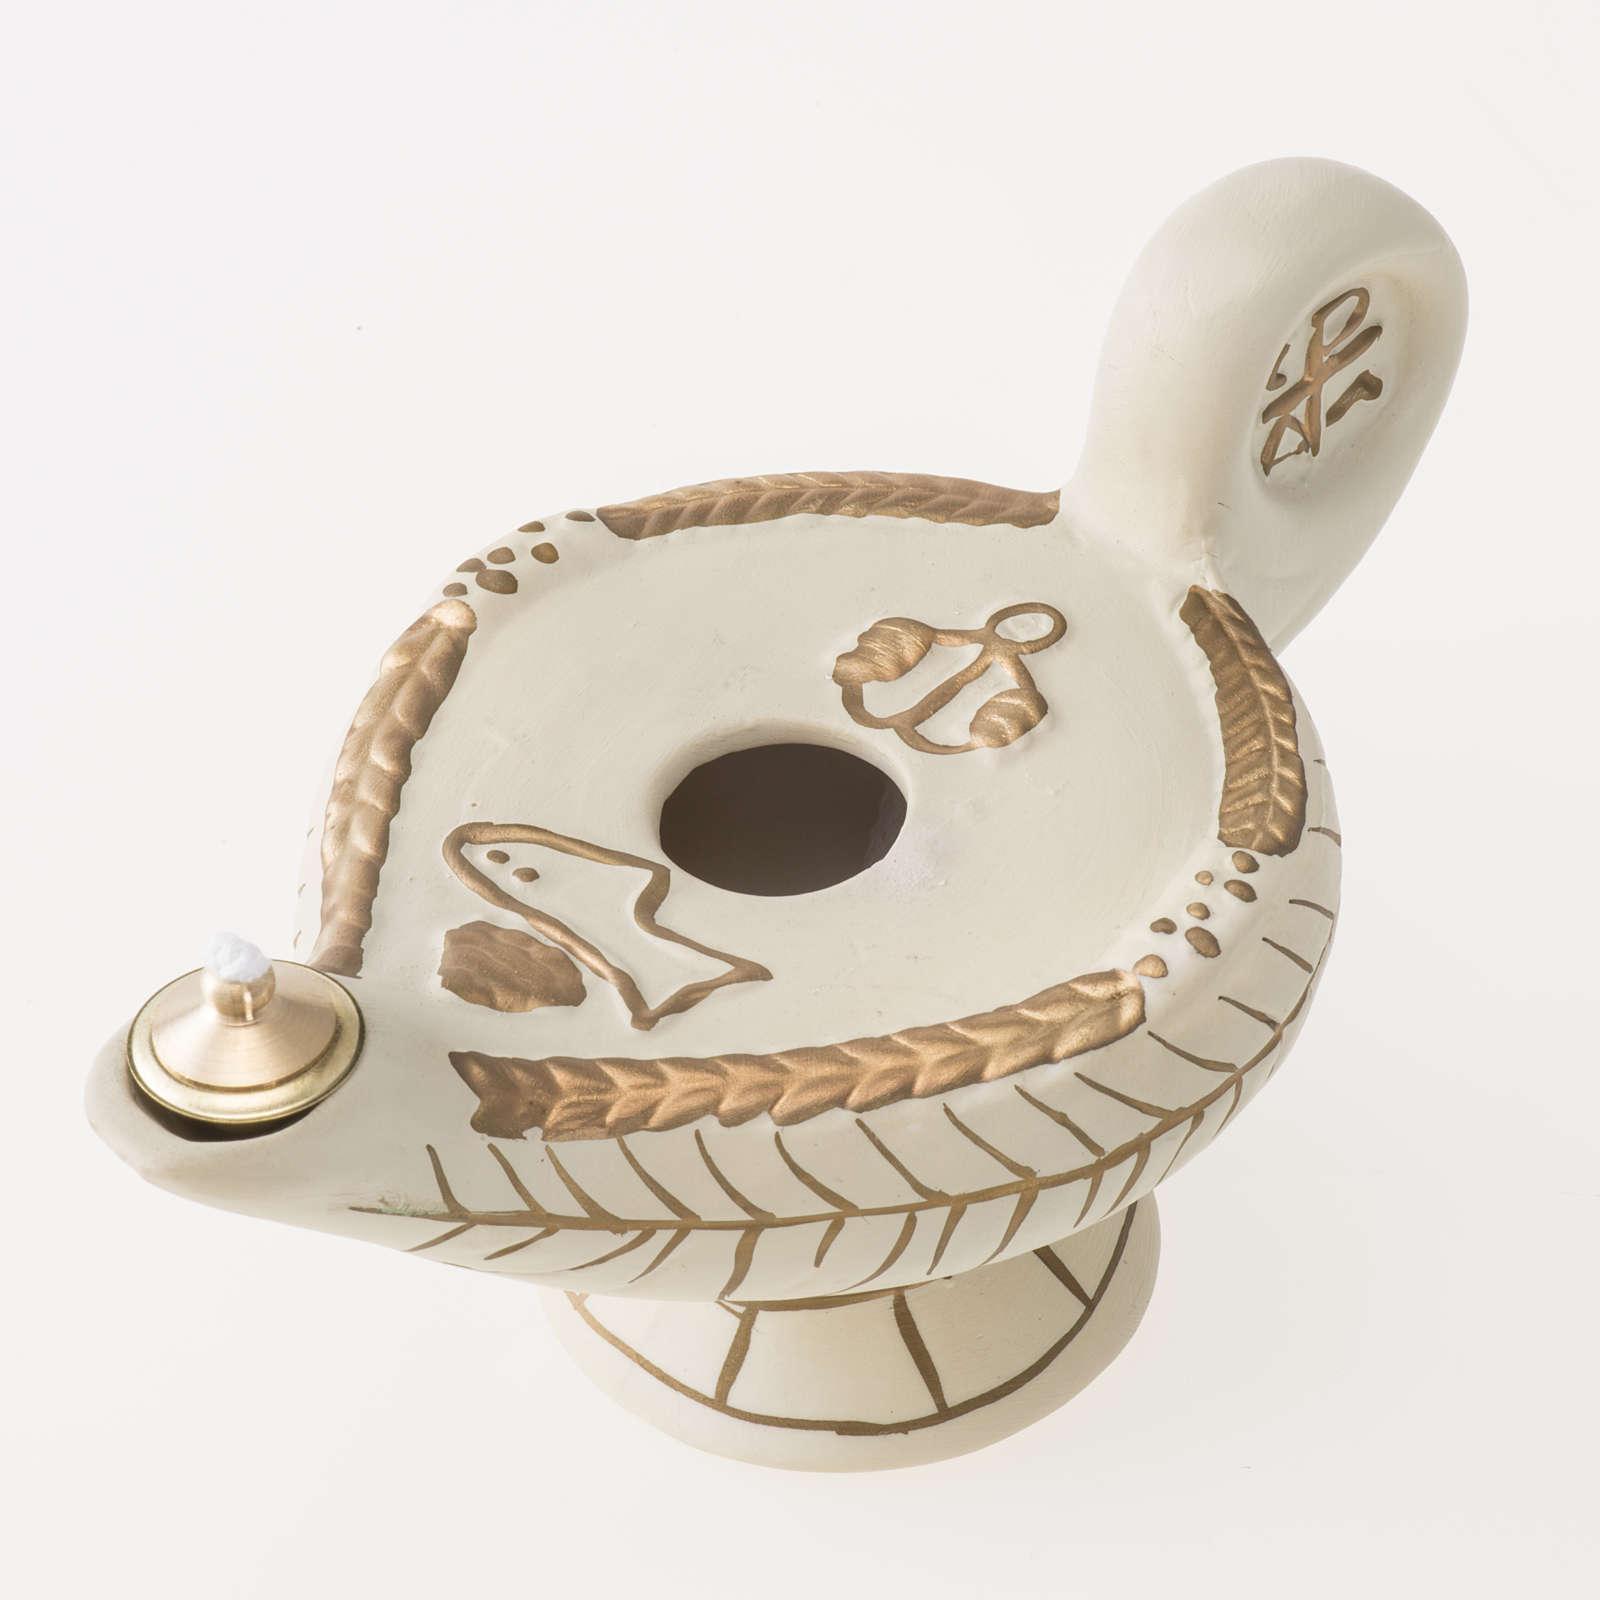 Lampe d'Aladin terre cuite ivoire mod. Alba 3